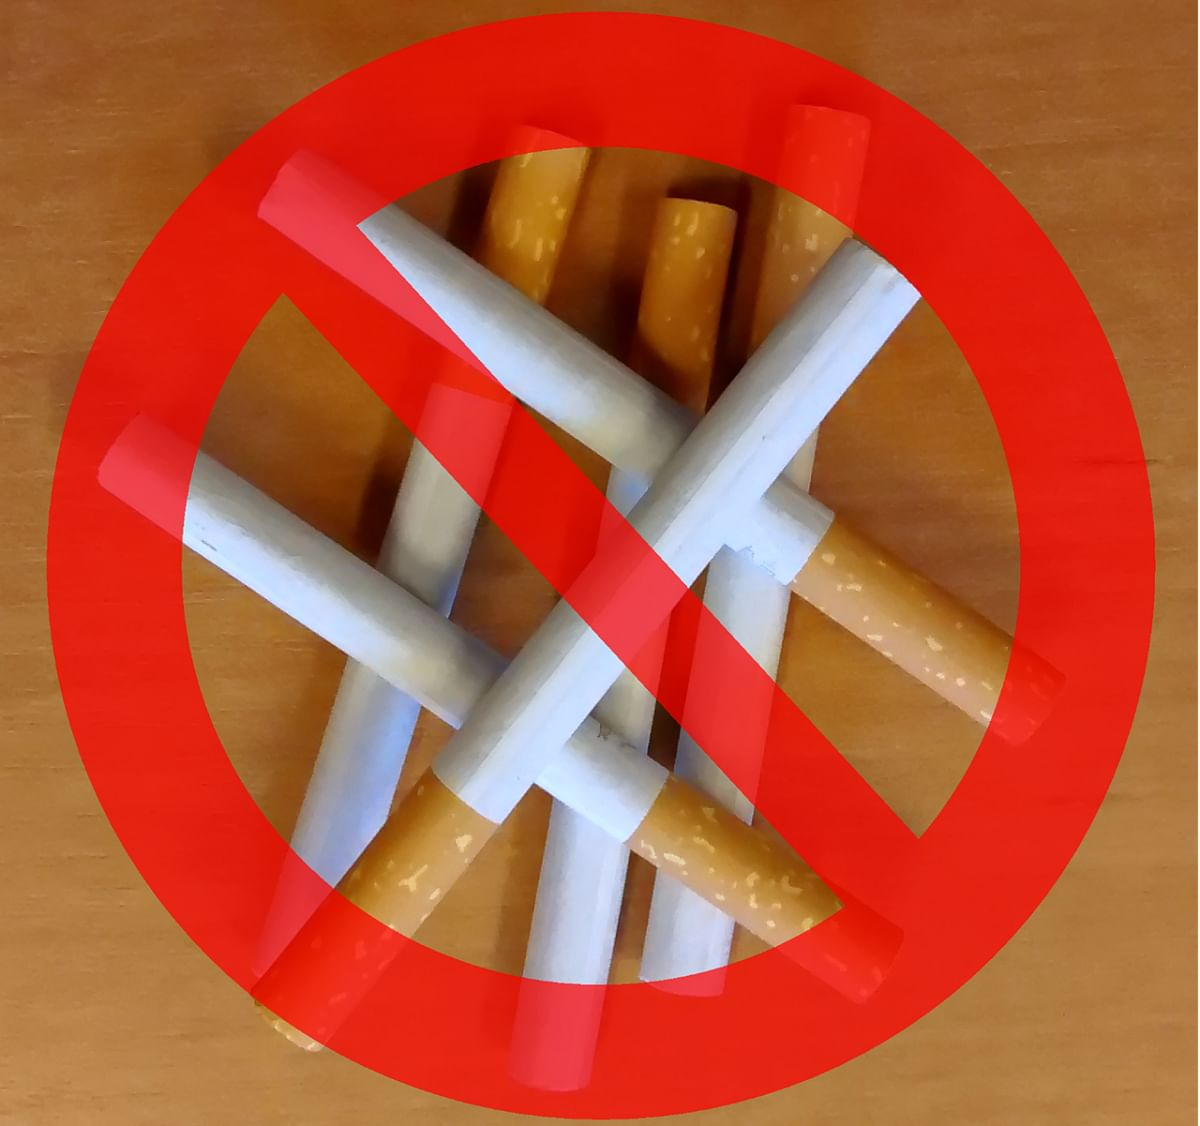 BHSS Uri organises seminar to celebrate 'World No Tobacco Day'